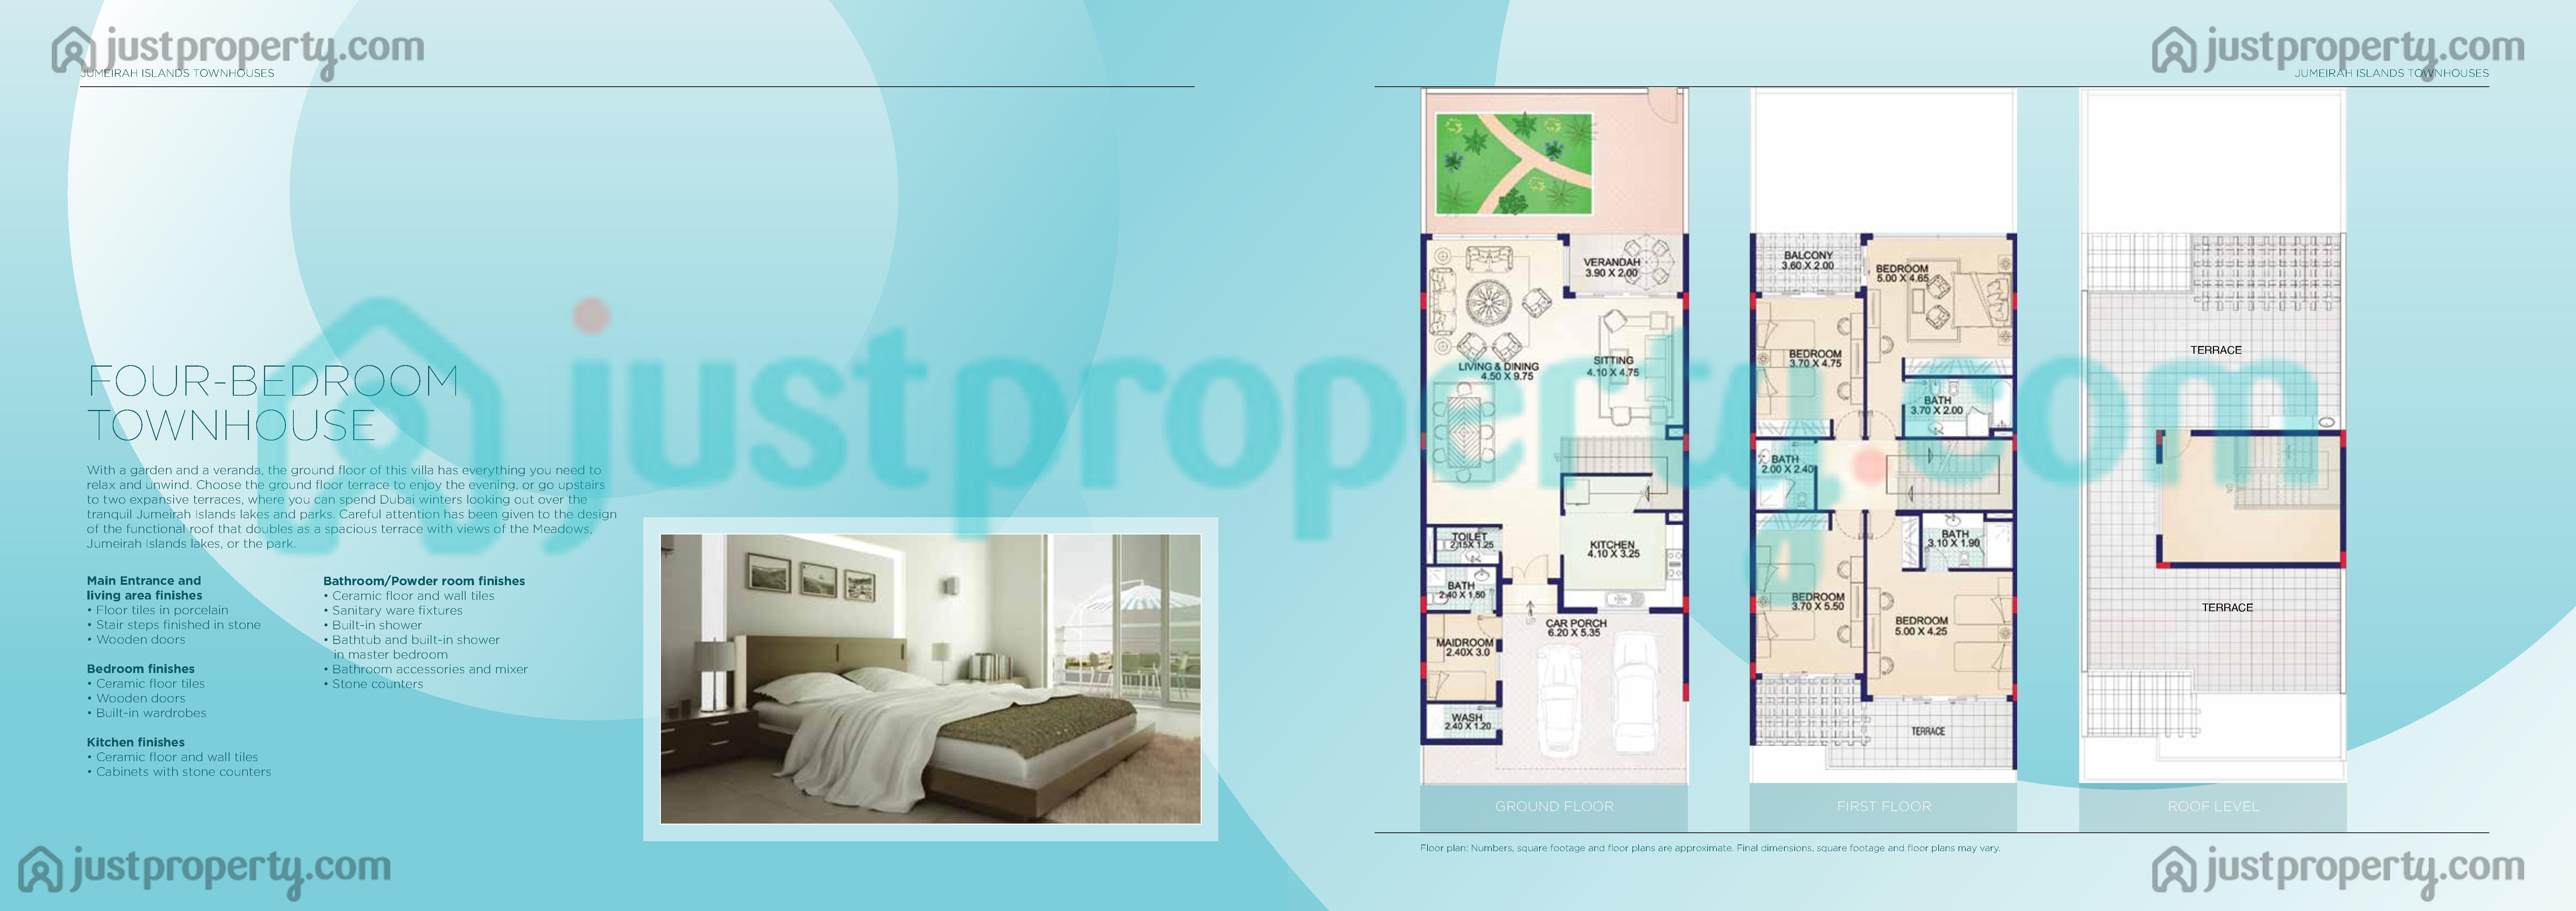 Jumeirah islands townhouses floor plans for Floor plans jumeirah islands